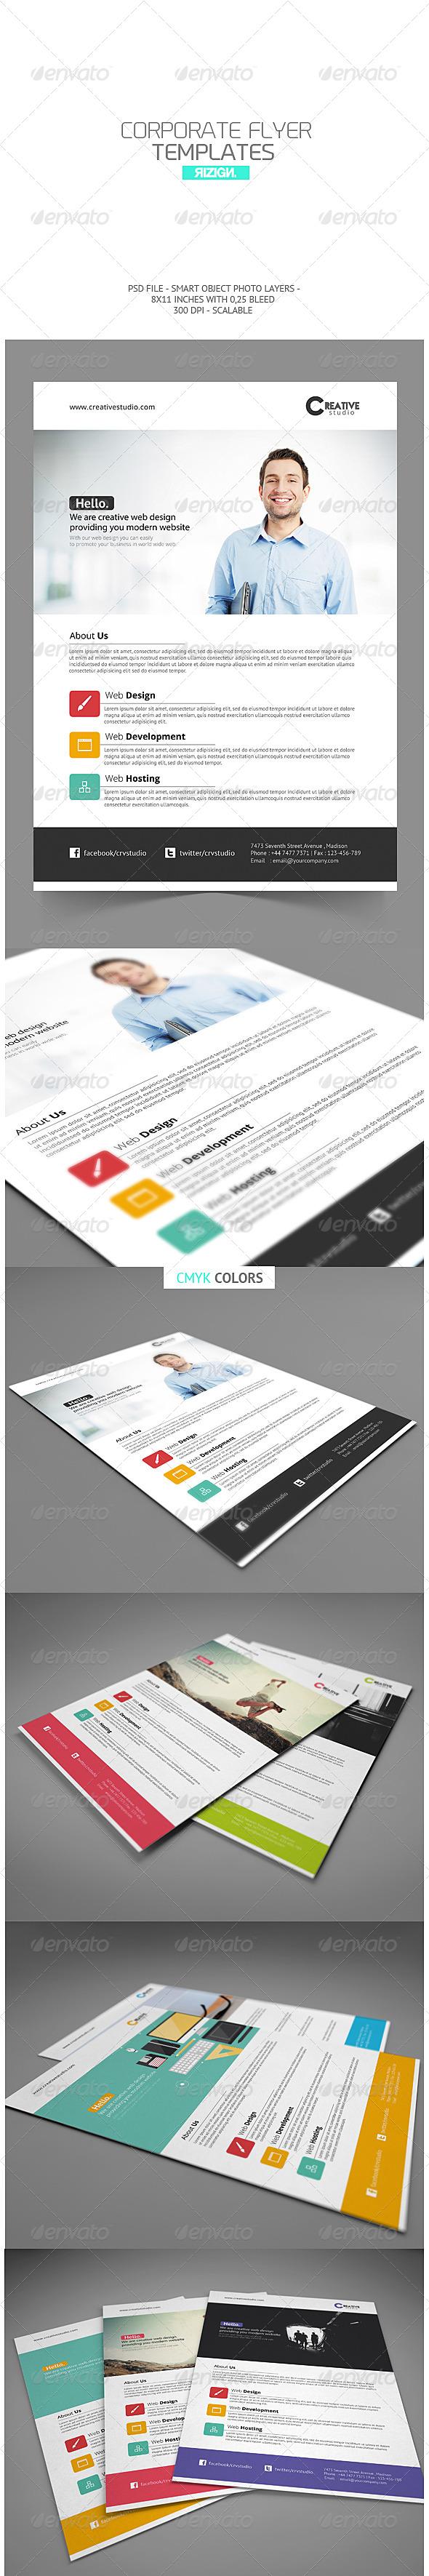 GraphicRiver Corporate Flyer 7019663